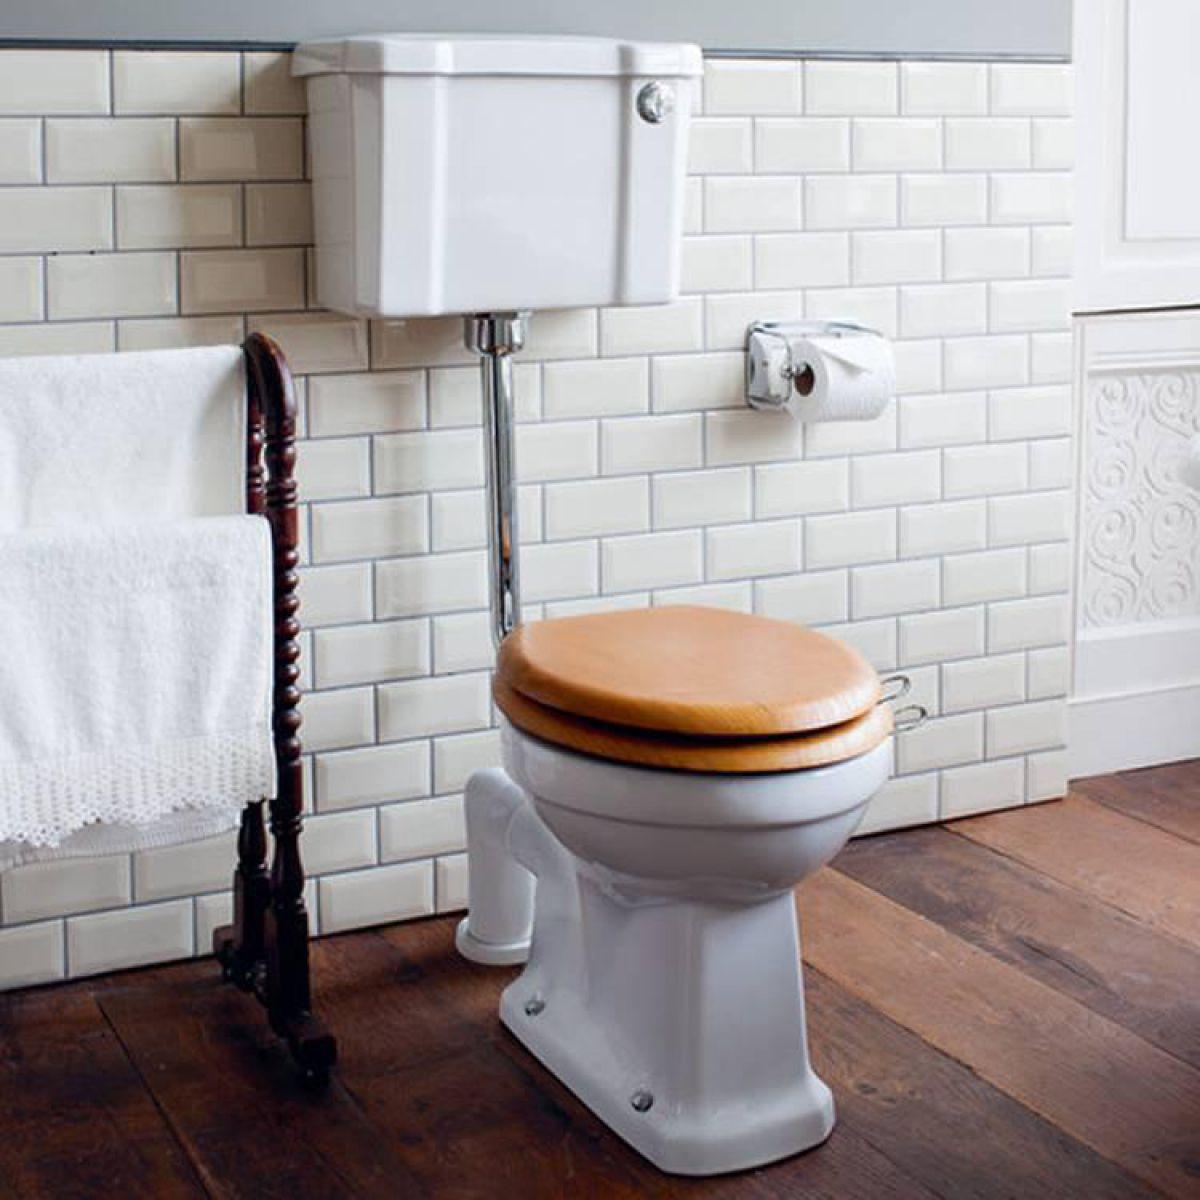 Burlington Edwardian Low Level Toilet.jpg